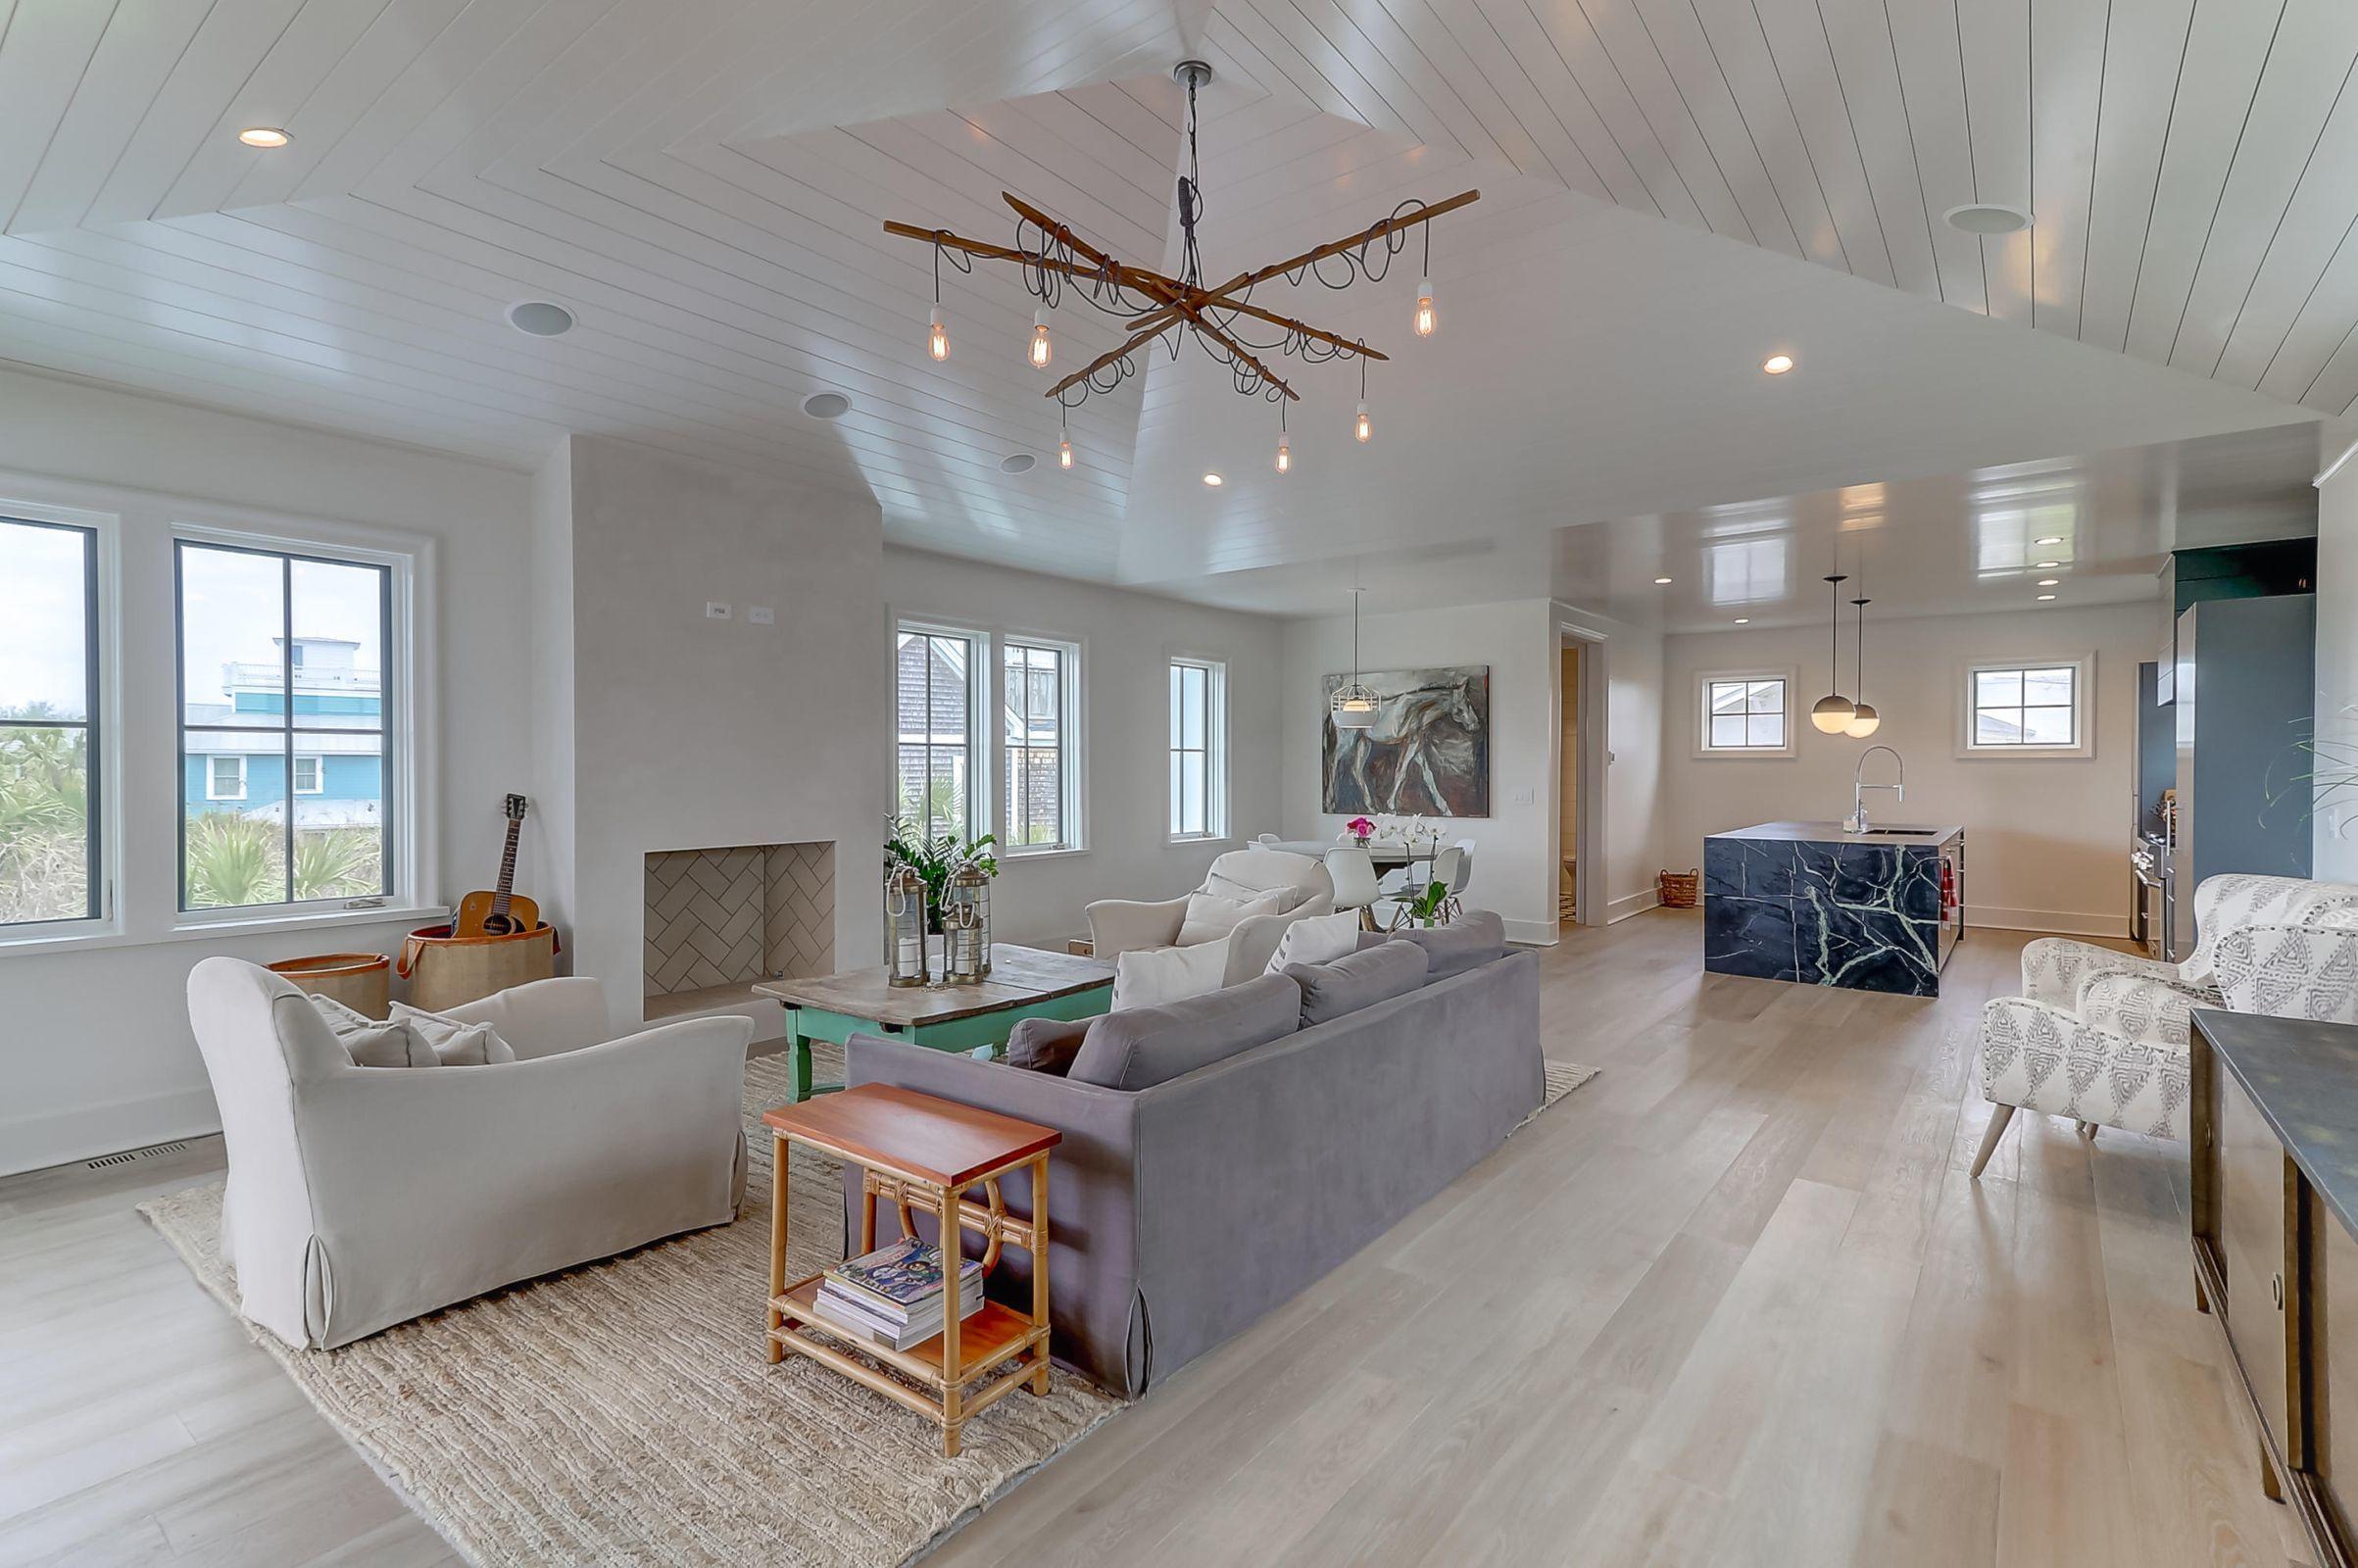 Sullivans Island Homes For Sale - 918 Middle, Sullivans Island, SC - 37